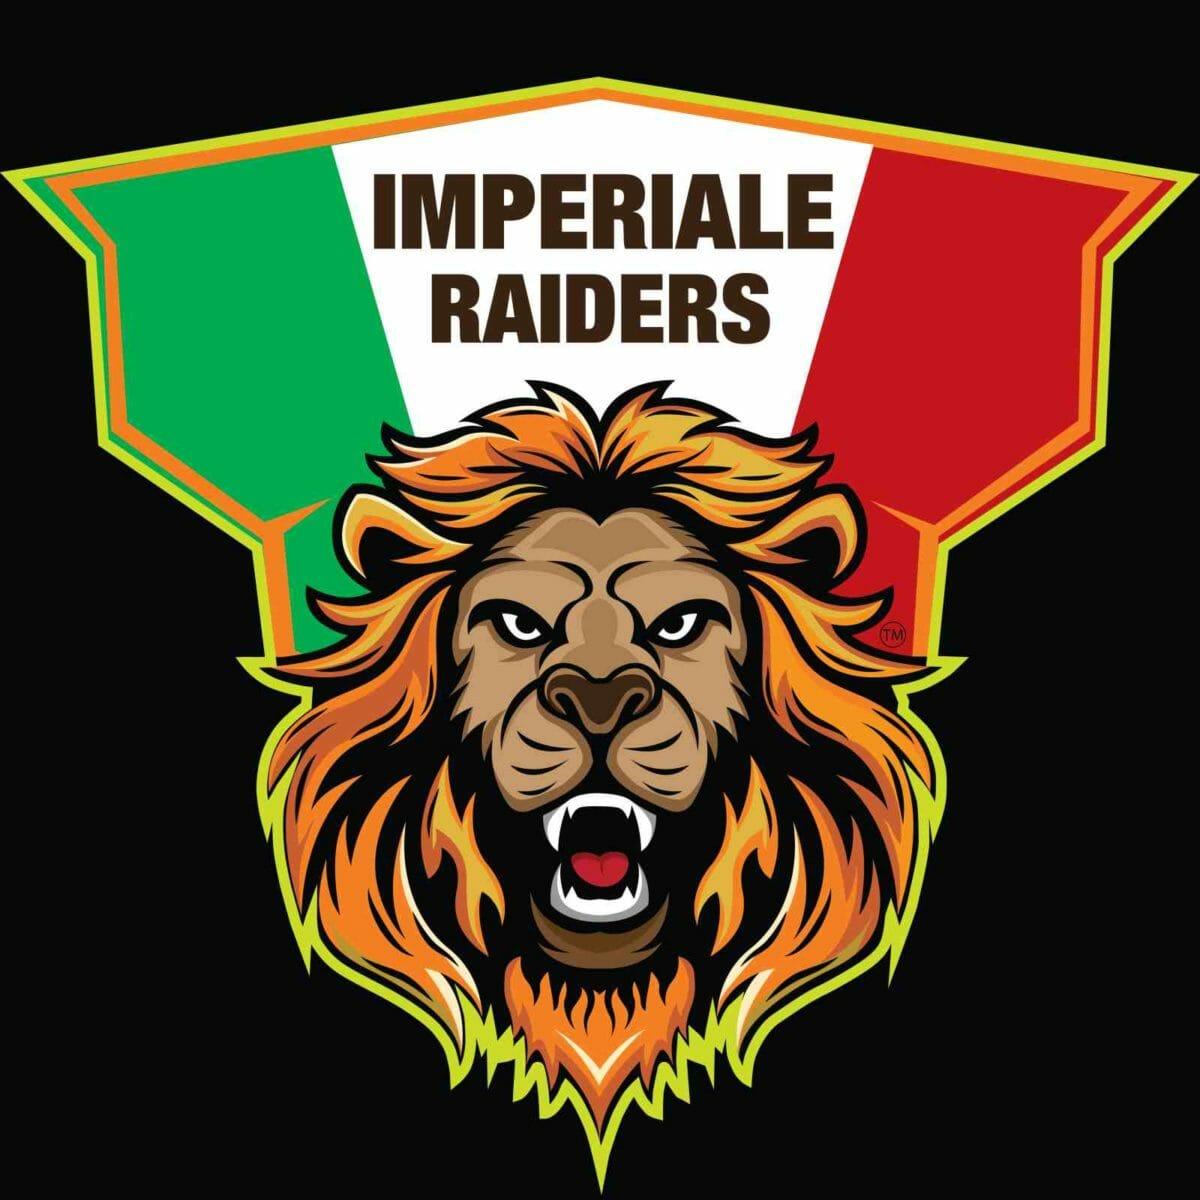 Benelli Imperiale Raiders logo